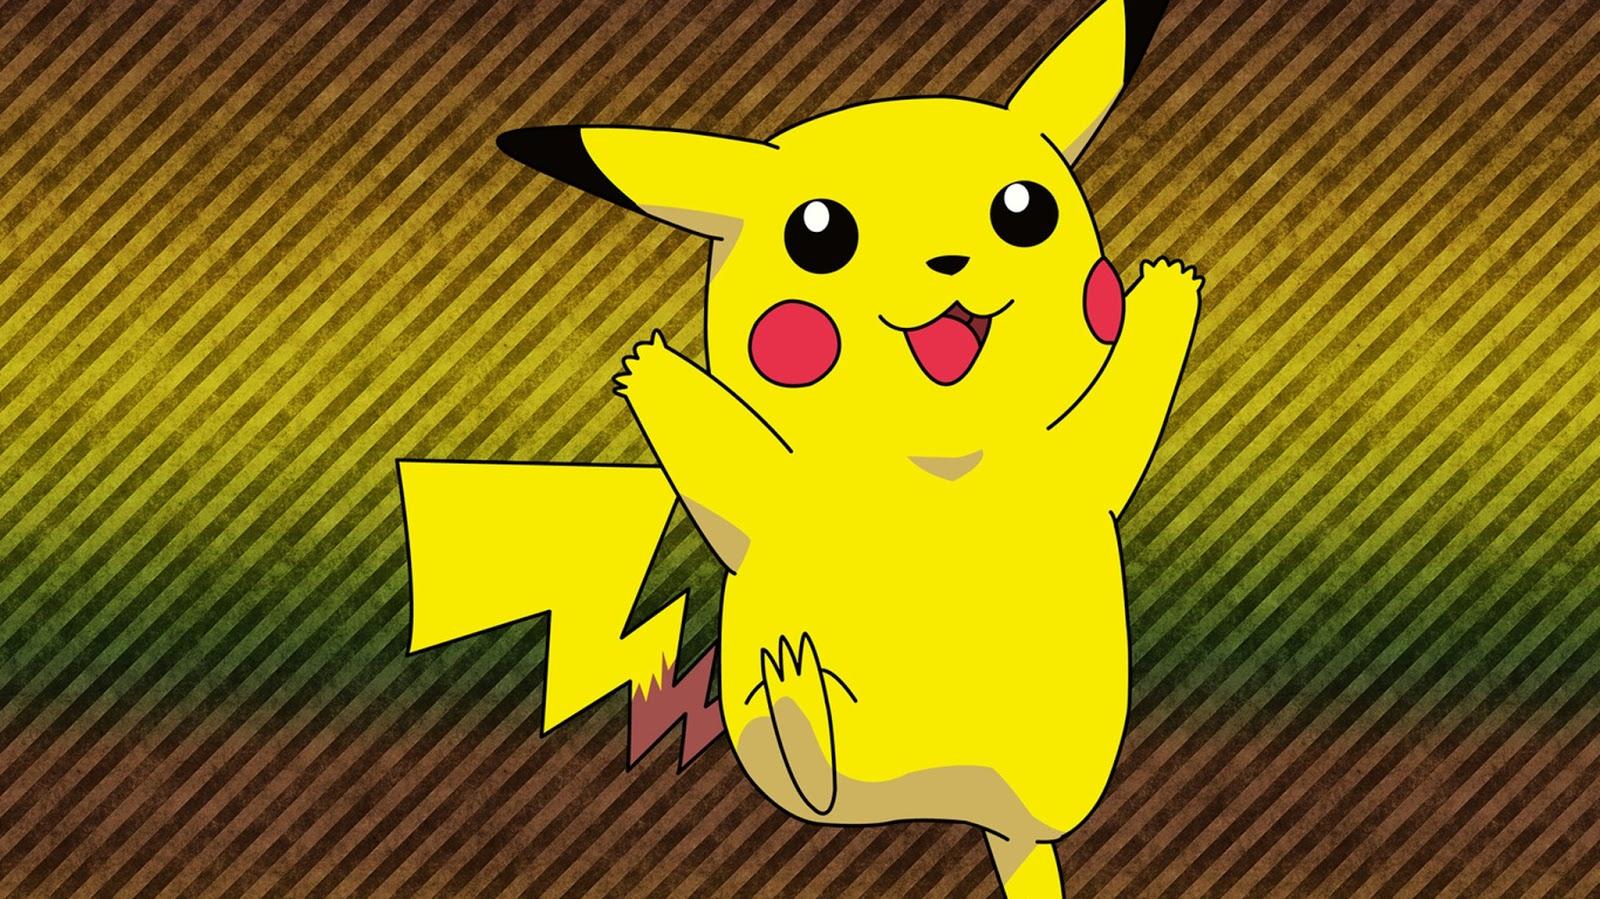 Pikachu wallpaper perfect wallpaper - Image pikachu ...